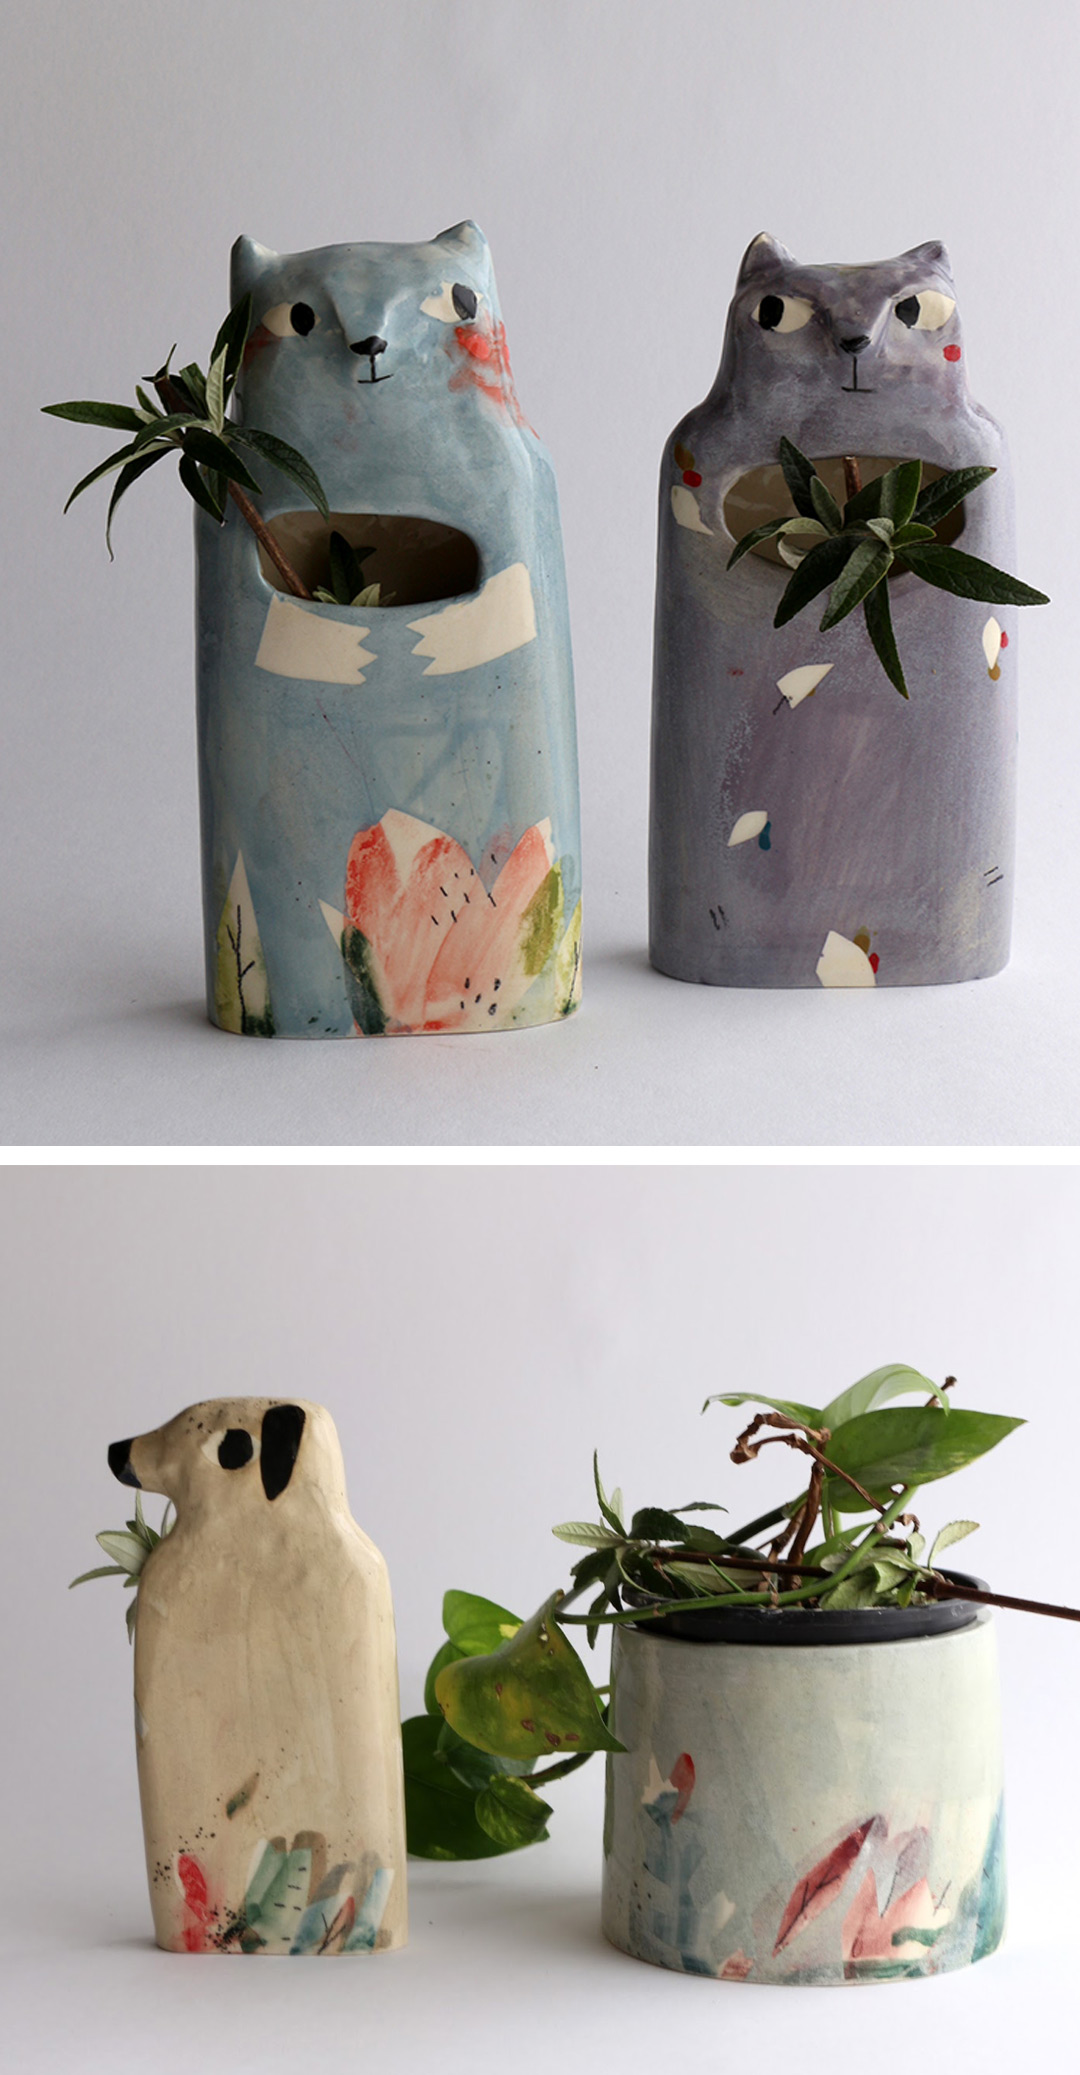 Painted ceramics by Elise Lefebvre